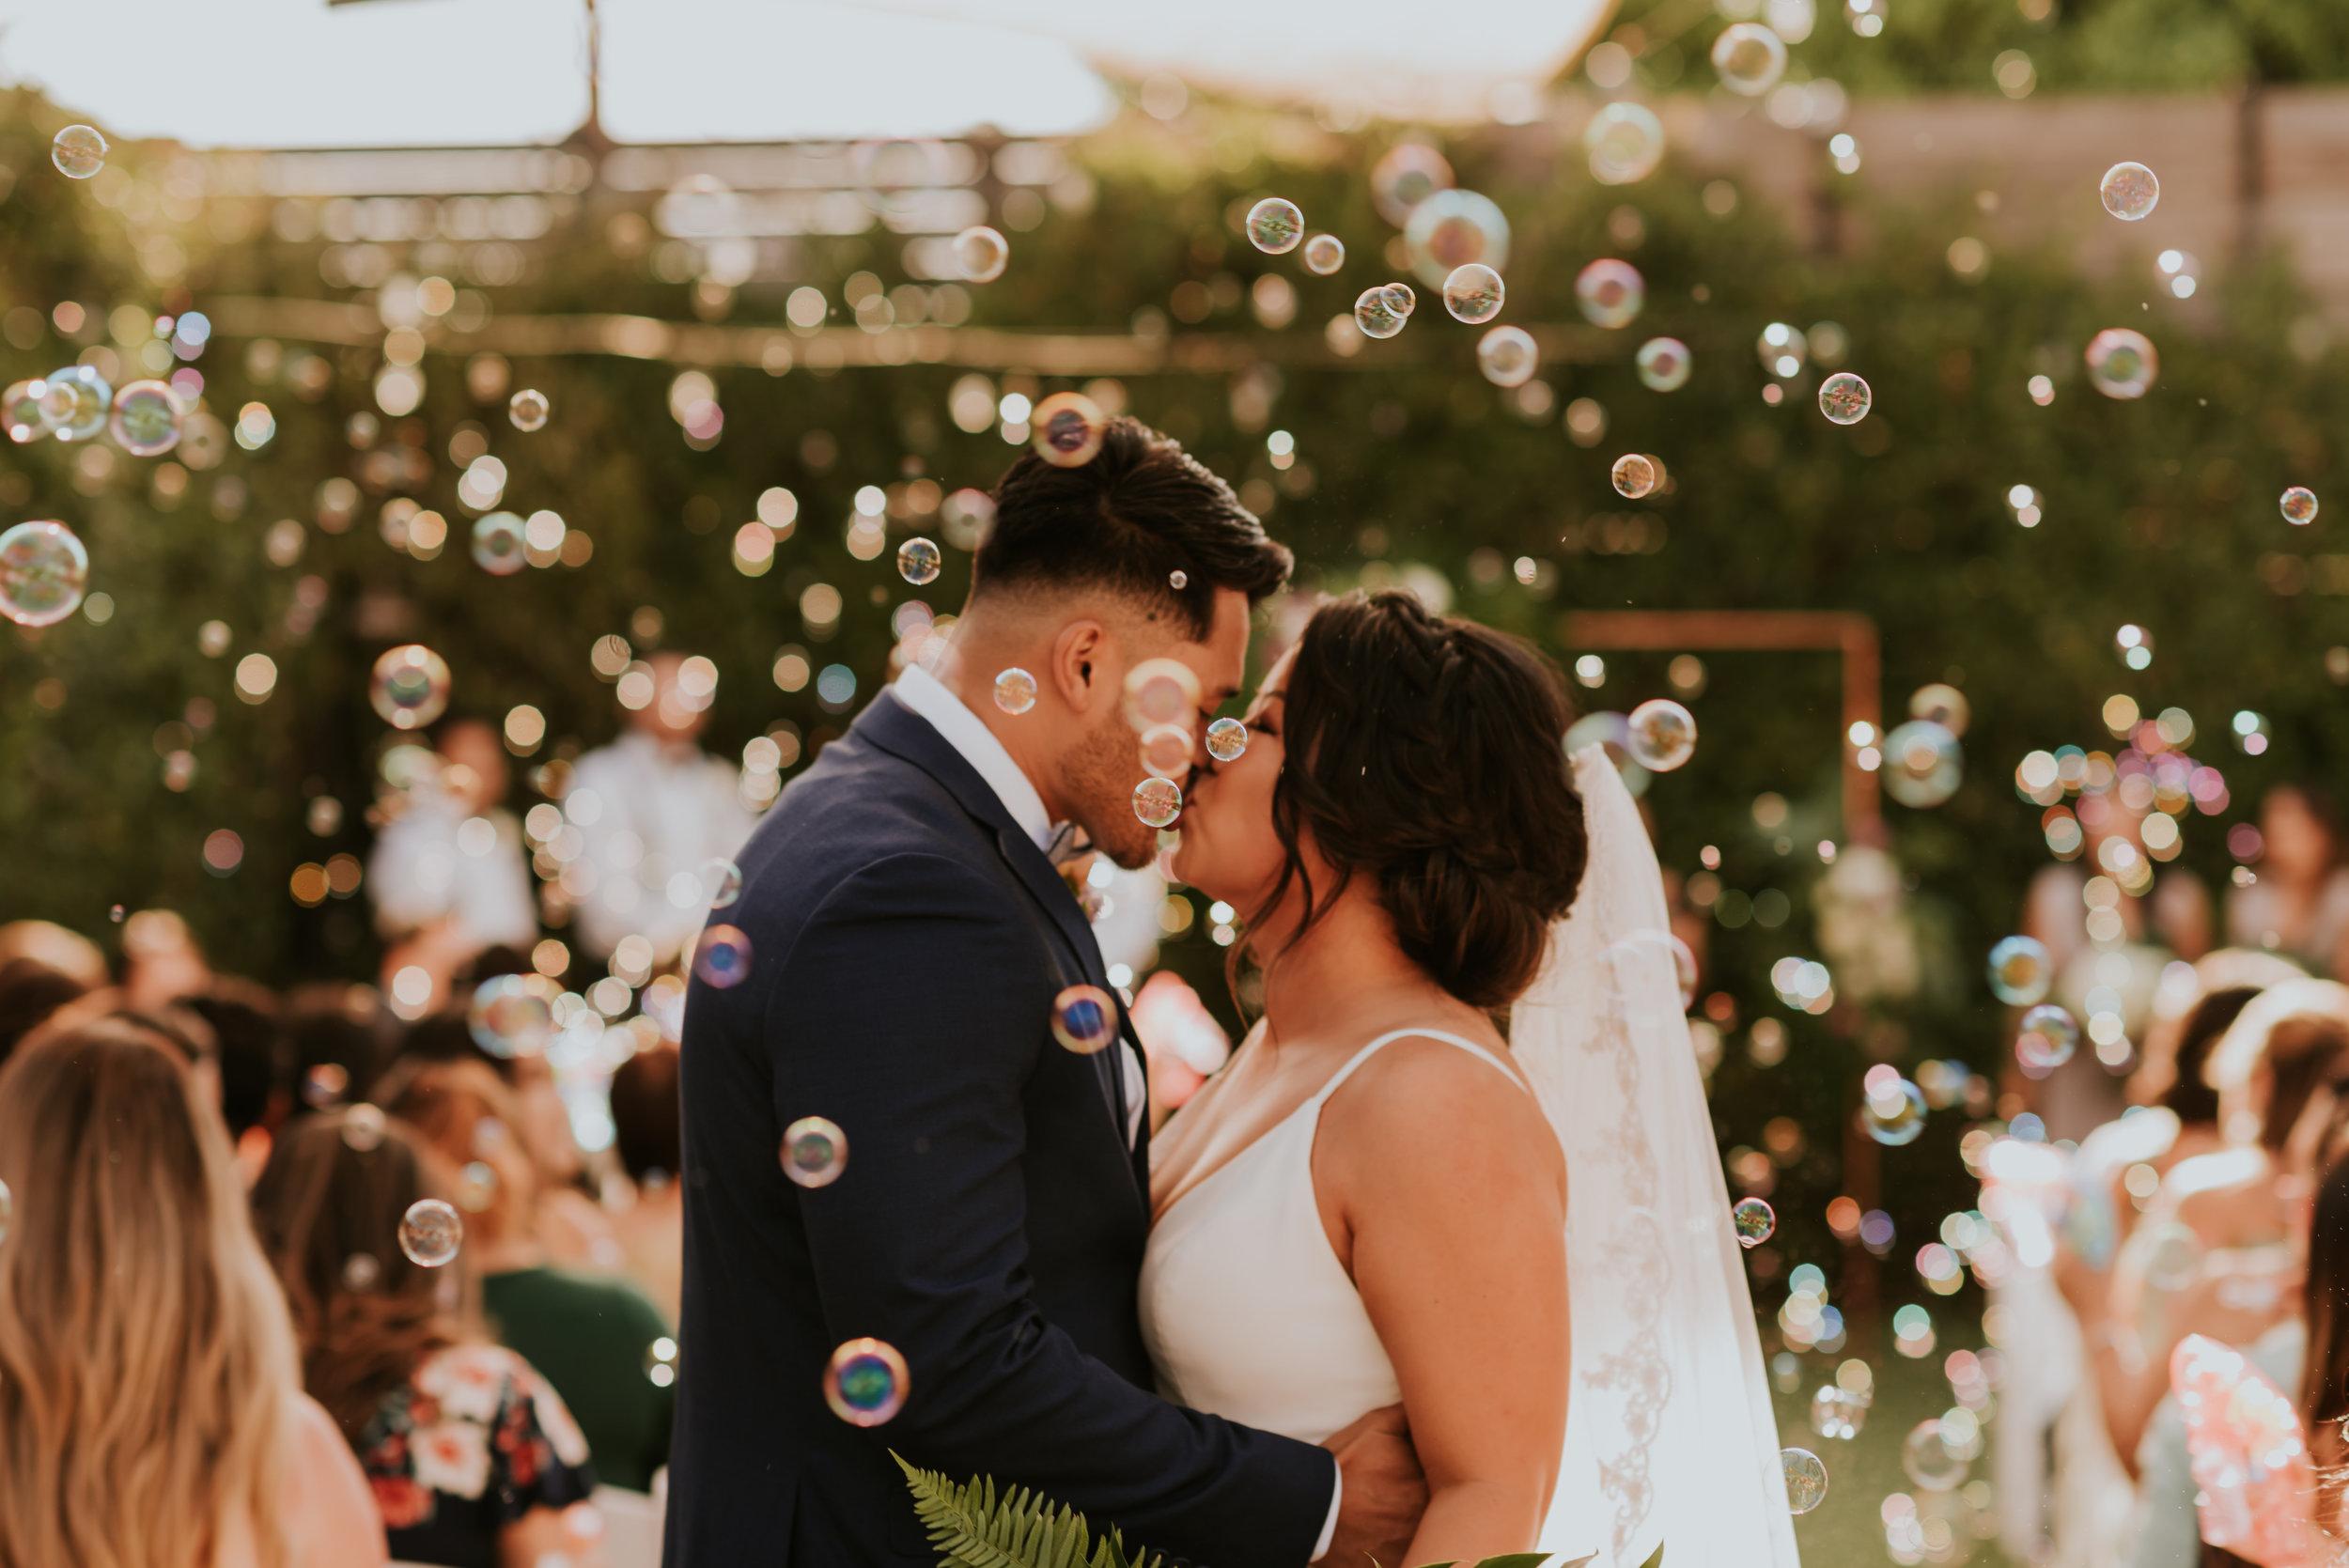 York Manor Wedding by Carrie Rogers Photography | Los Angeles Wedding Photographer | California Wedding